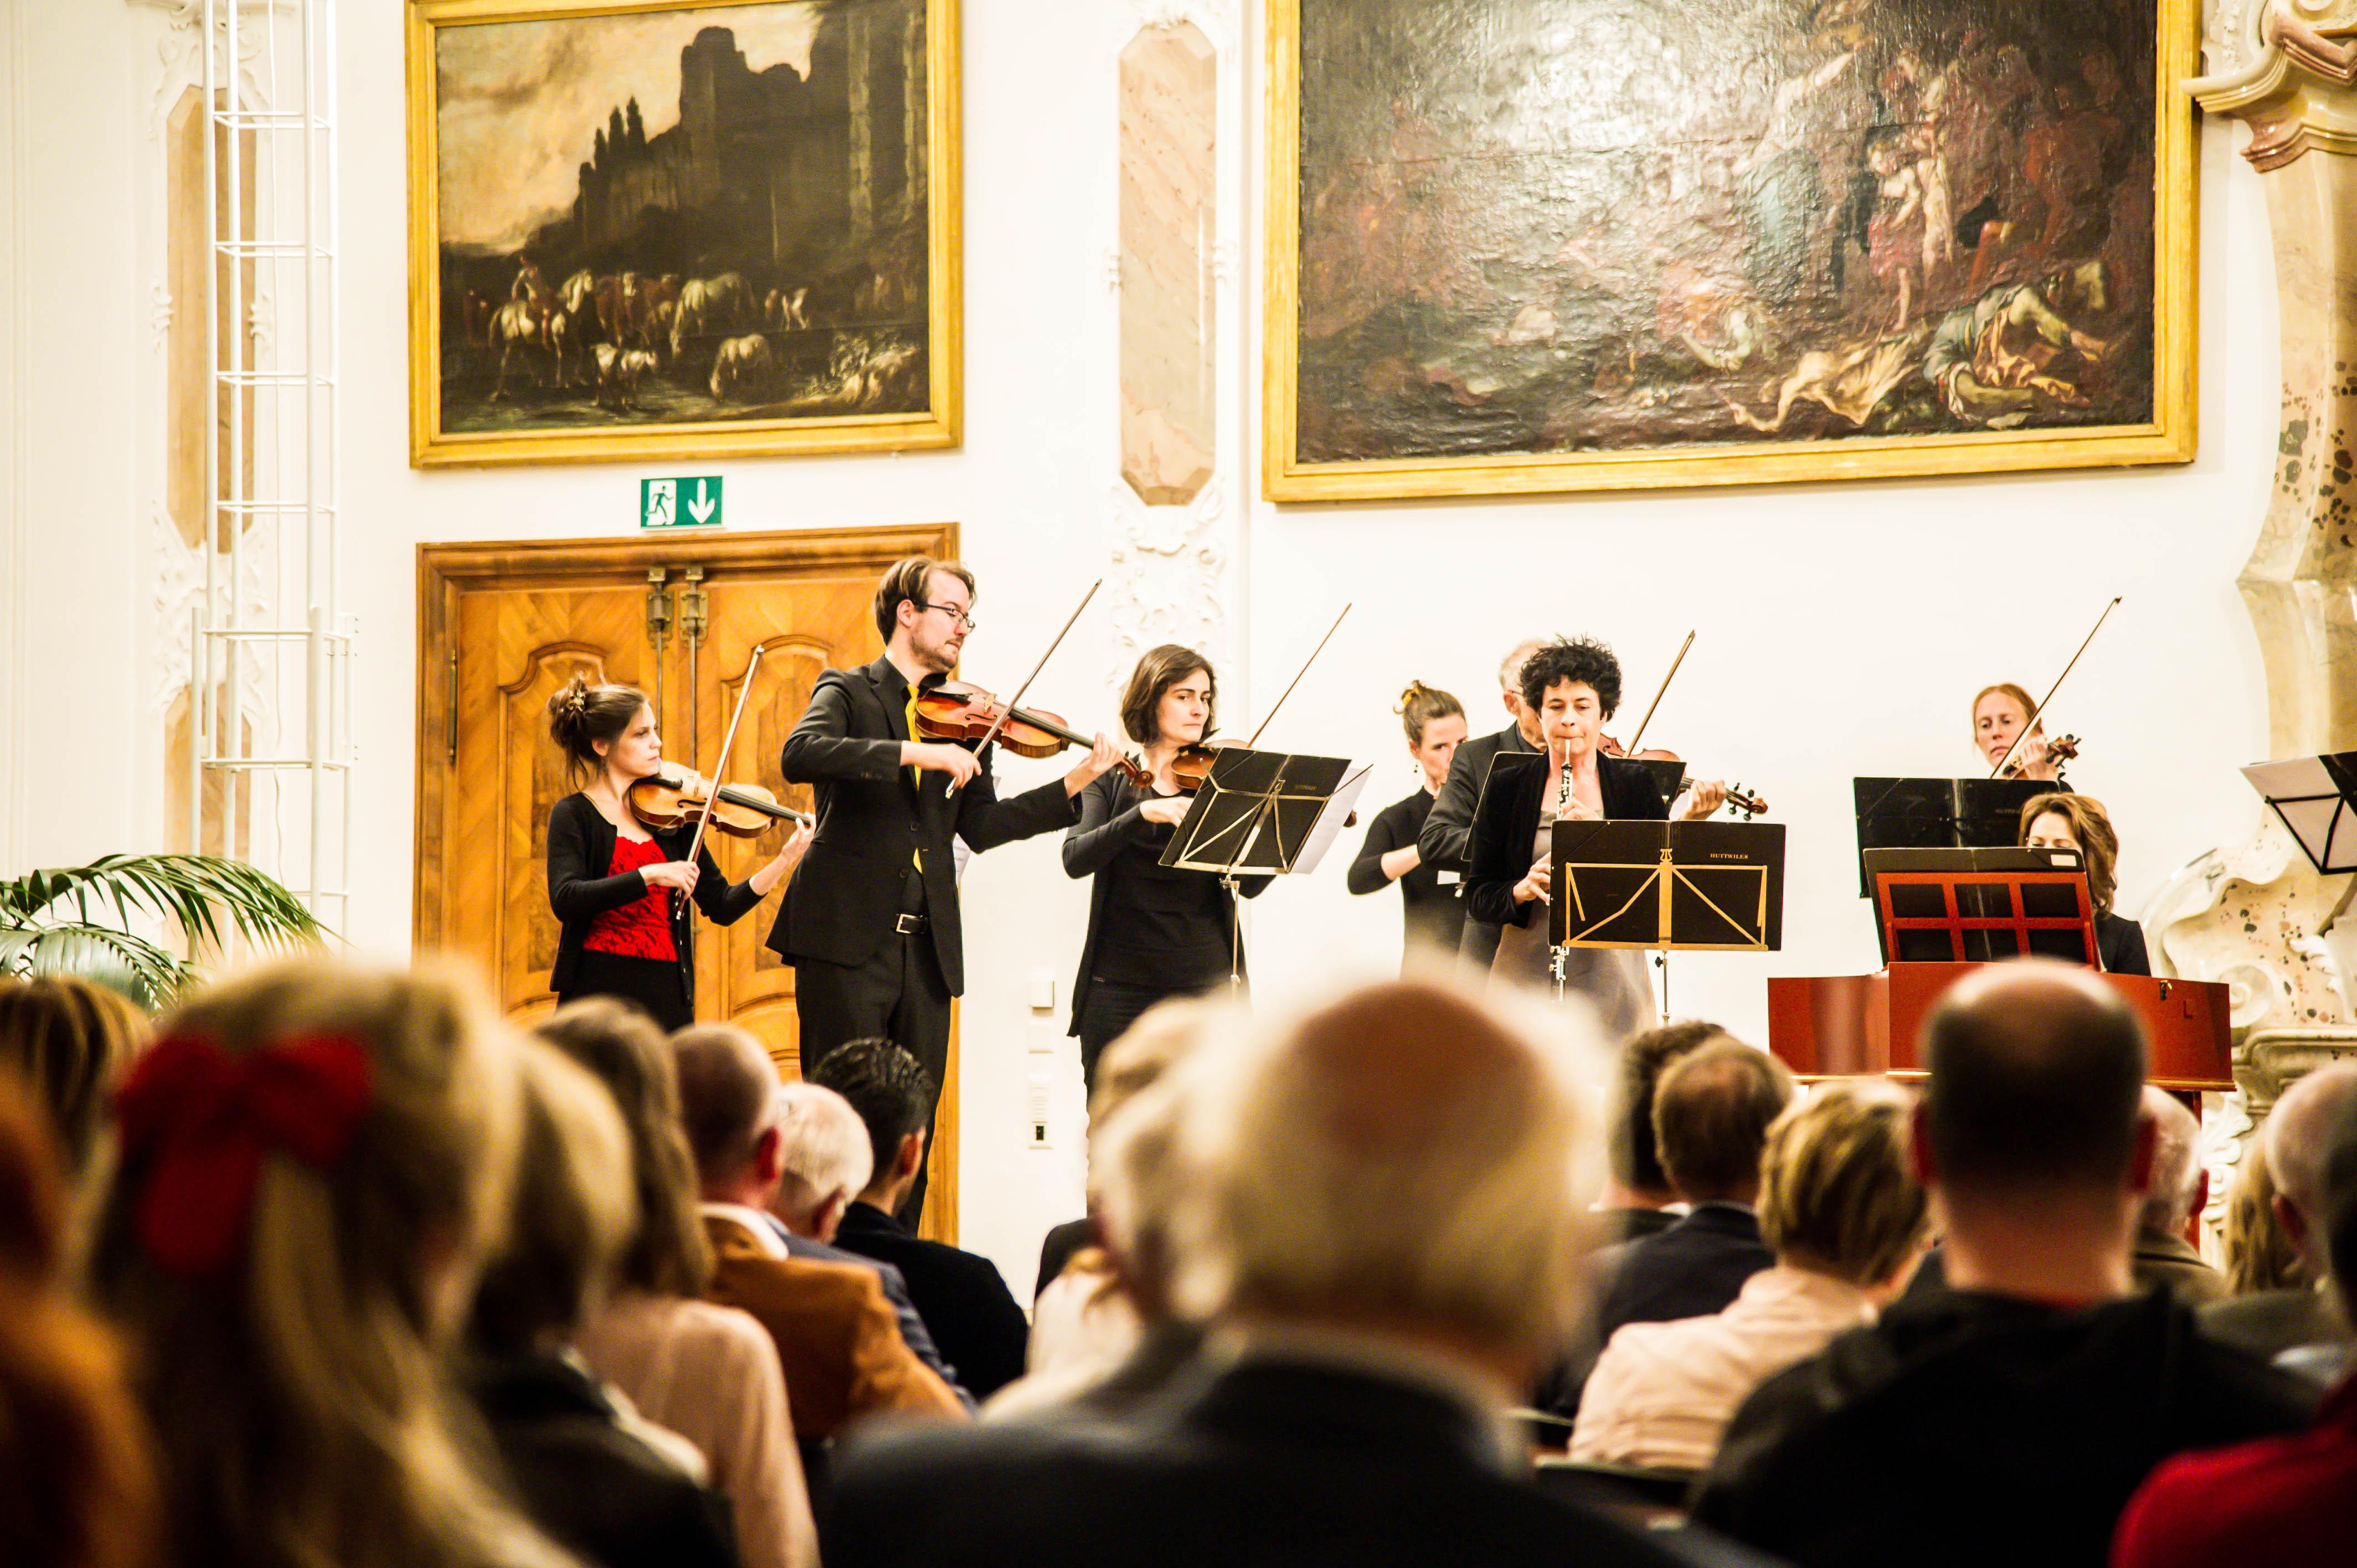 17_09_Herbstkonzert Kammerorchester Huttwil_BO-32